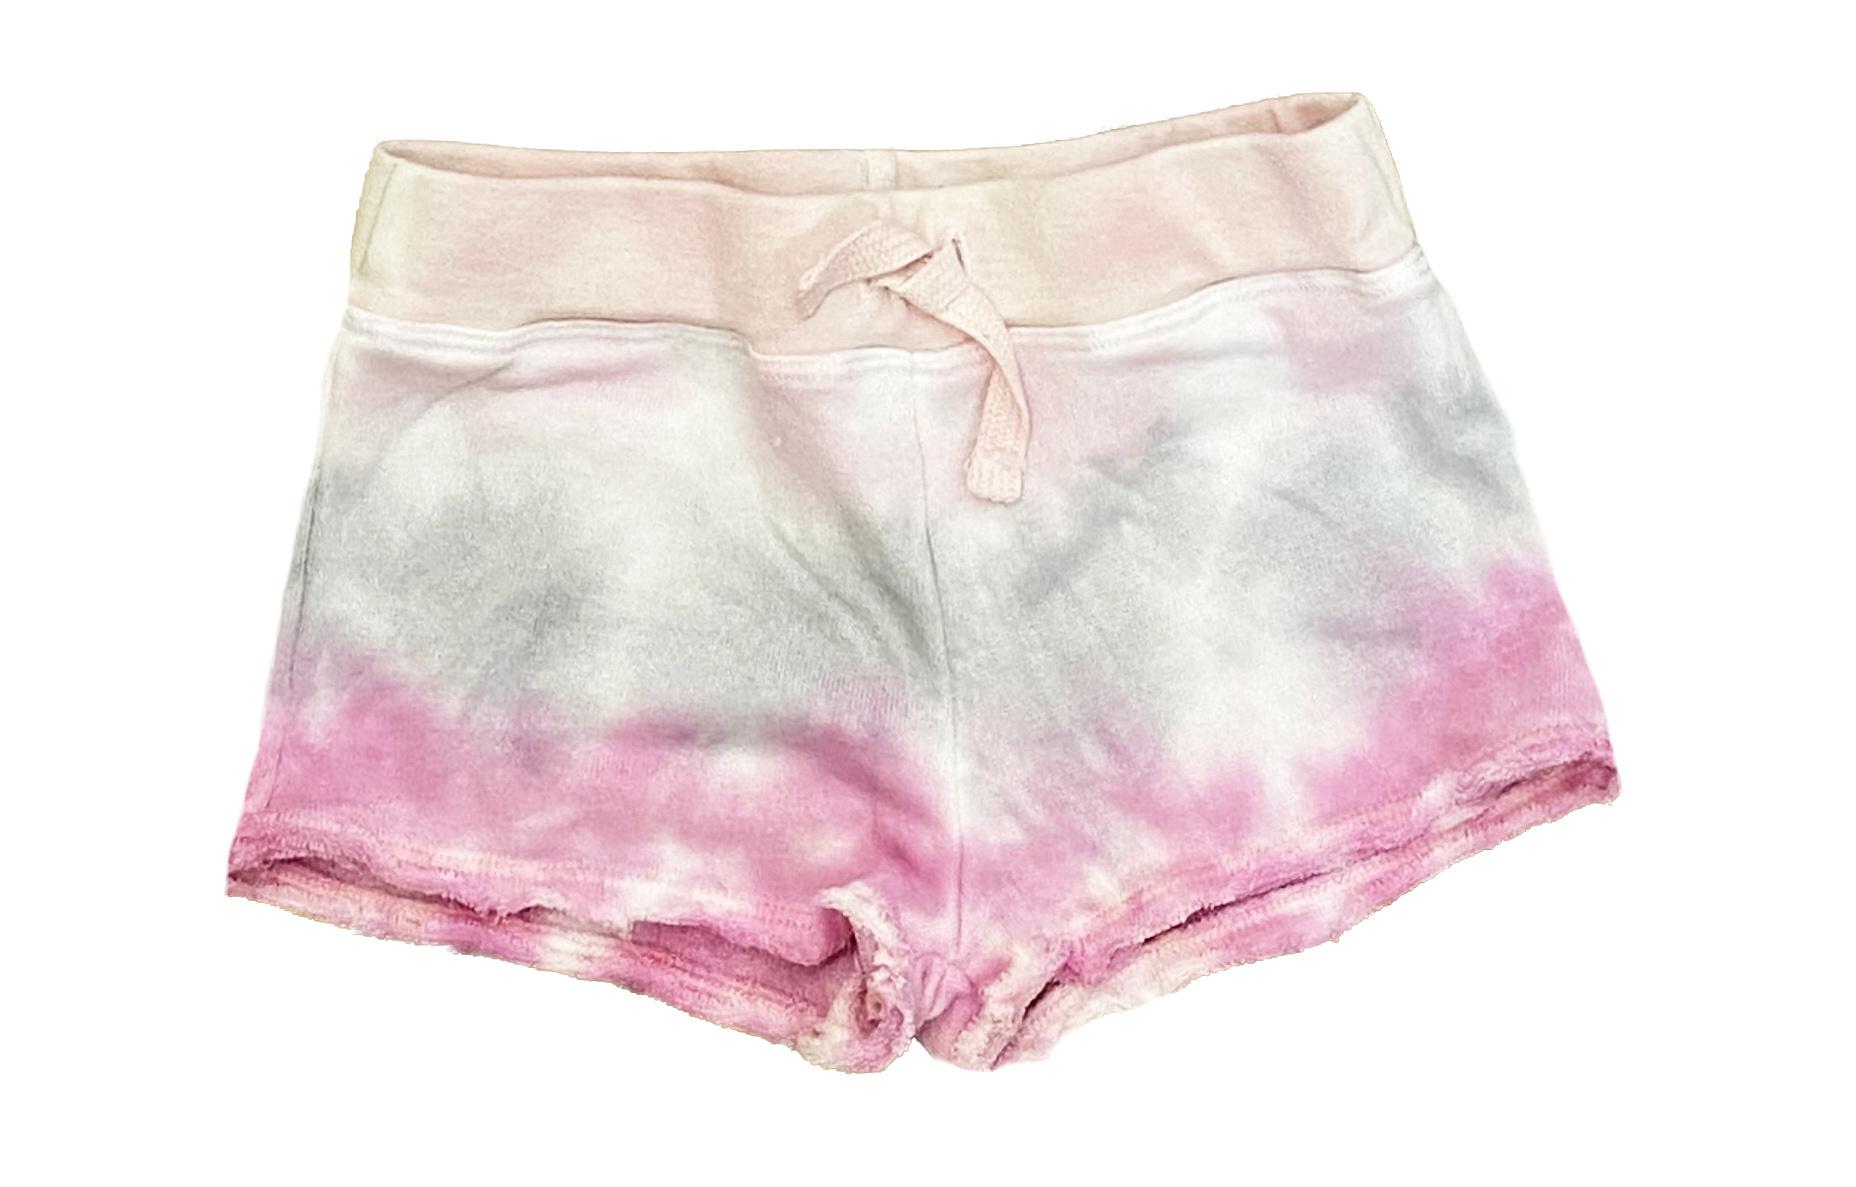 Cozii Pink/Grey TD Infant Sweatshorts